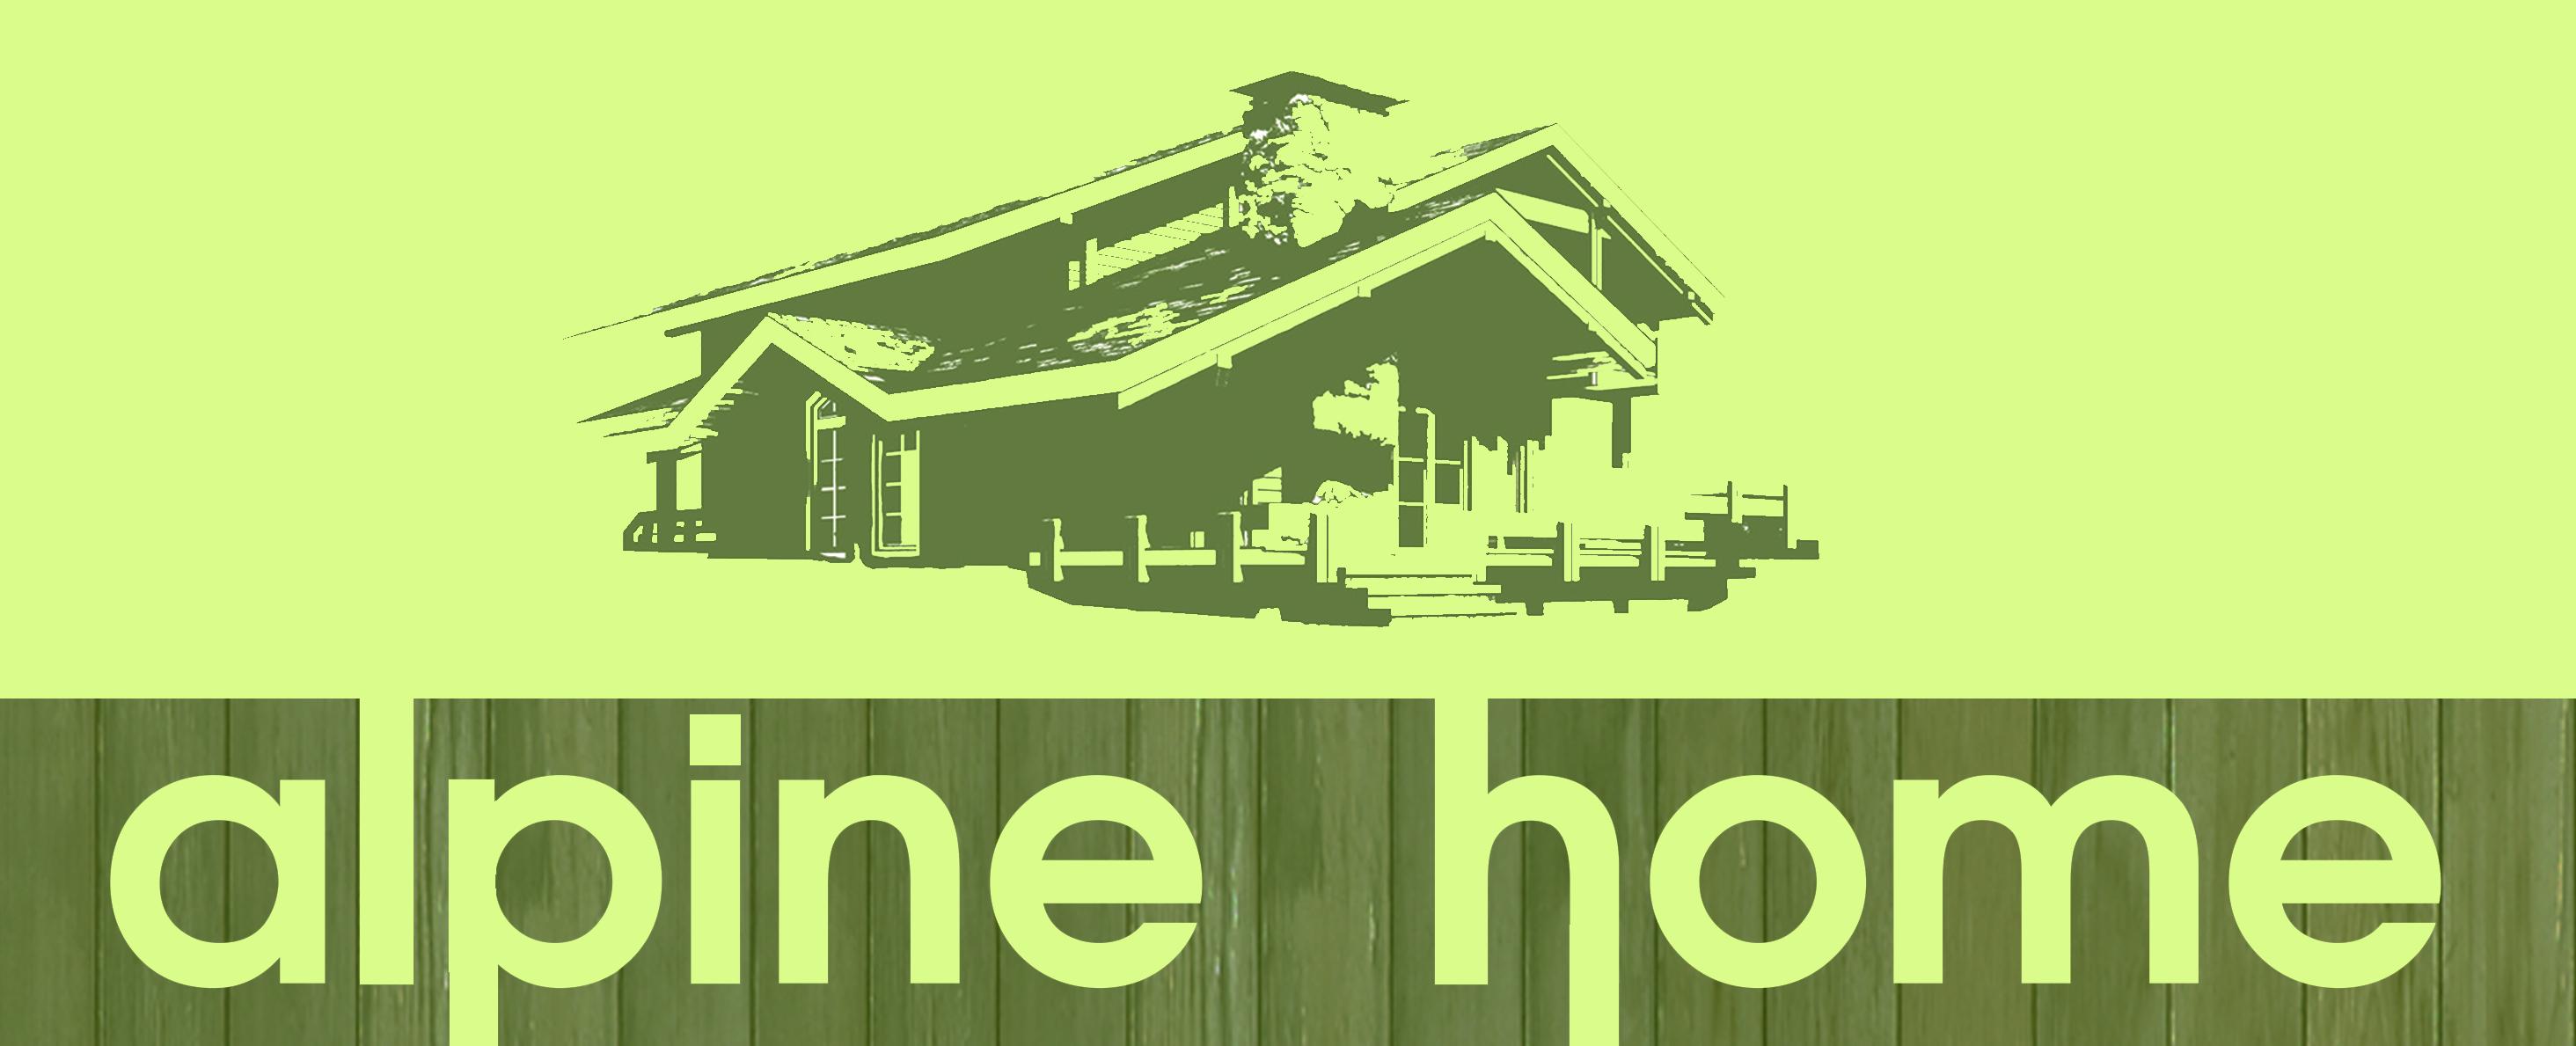 Alpine-home Image